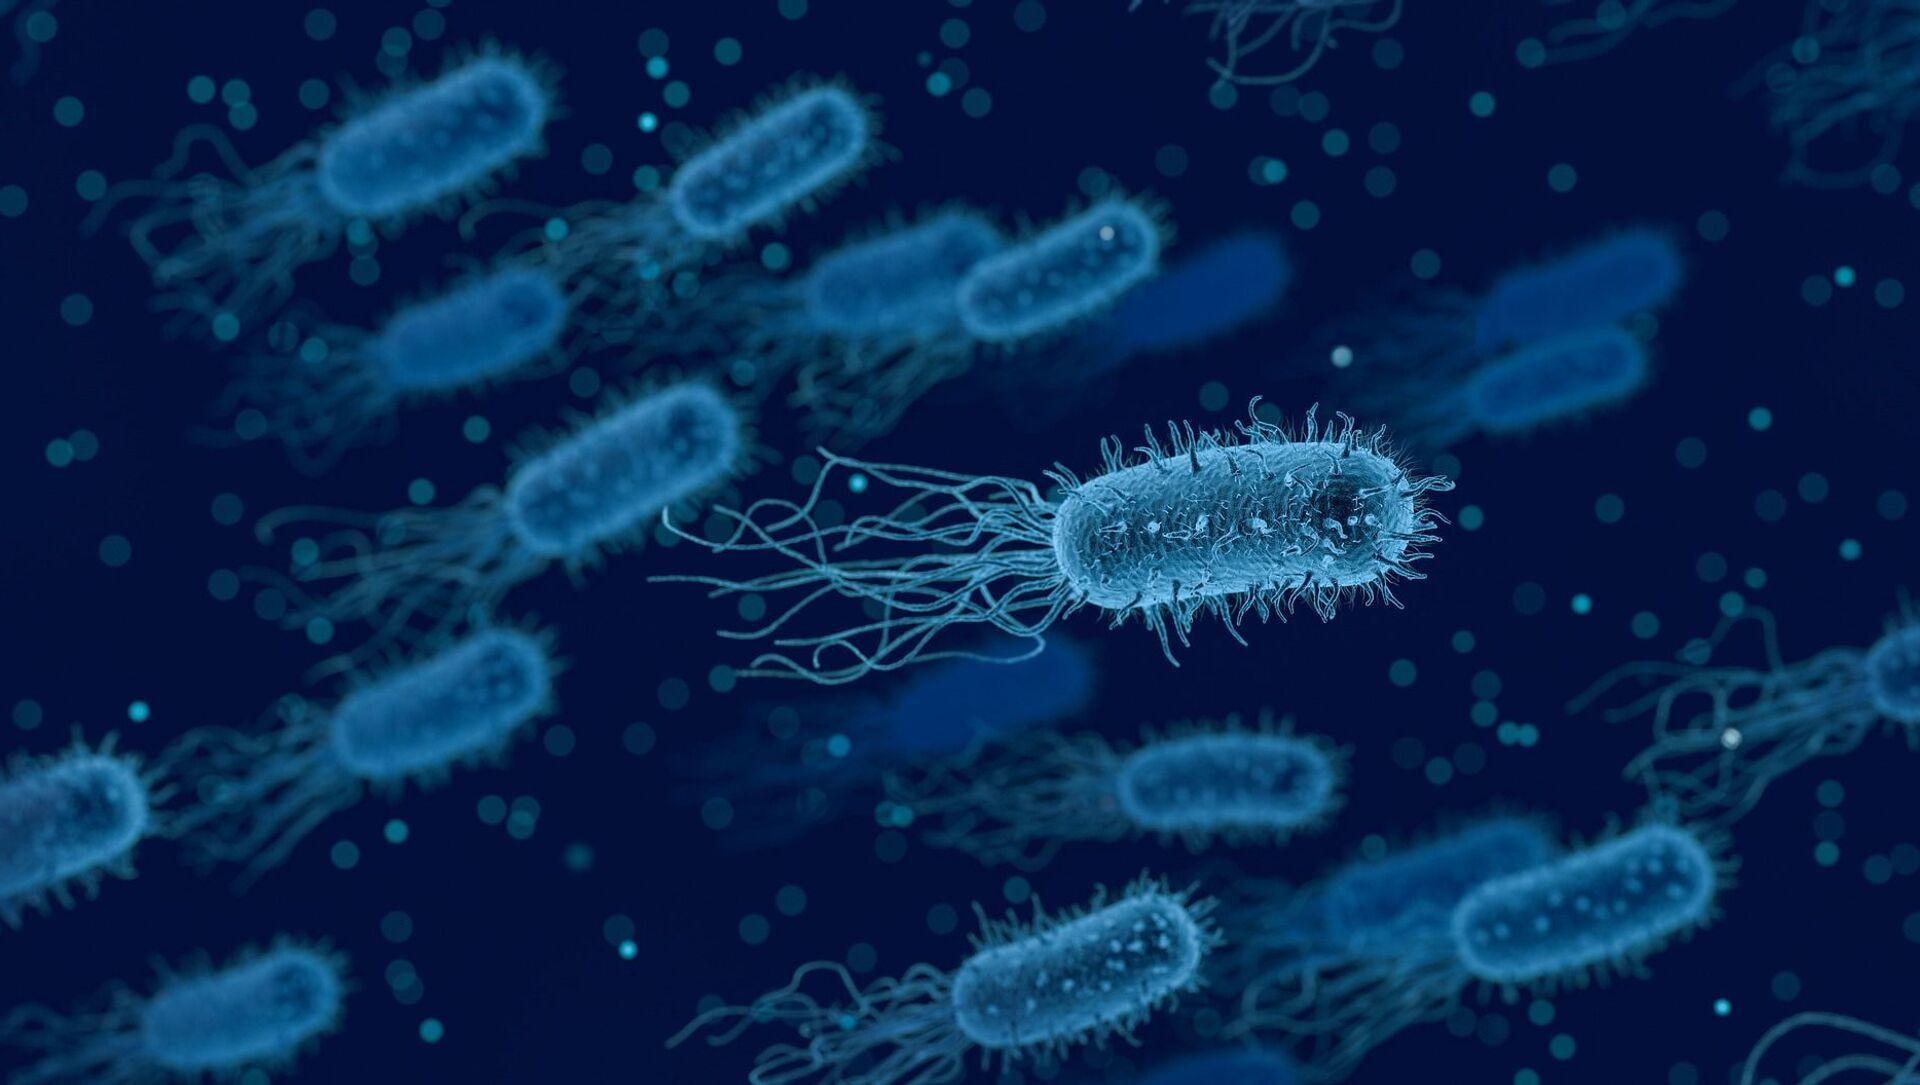 Una bacteria (imagen referencial) - Sputnik Mundo, 1920, 01.02.2021